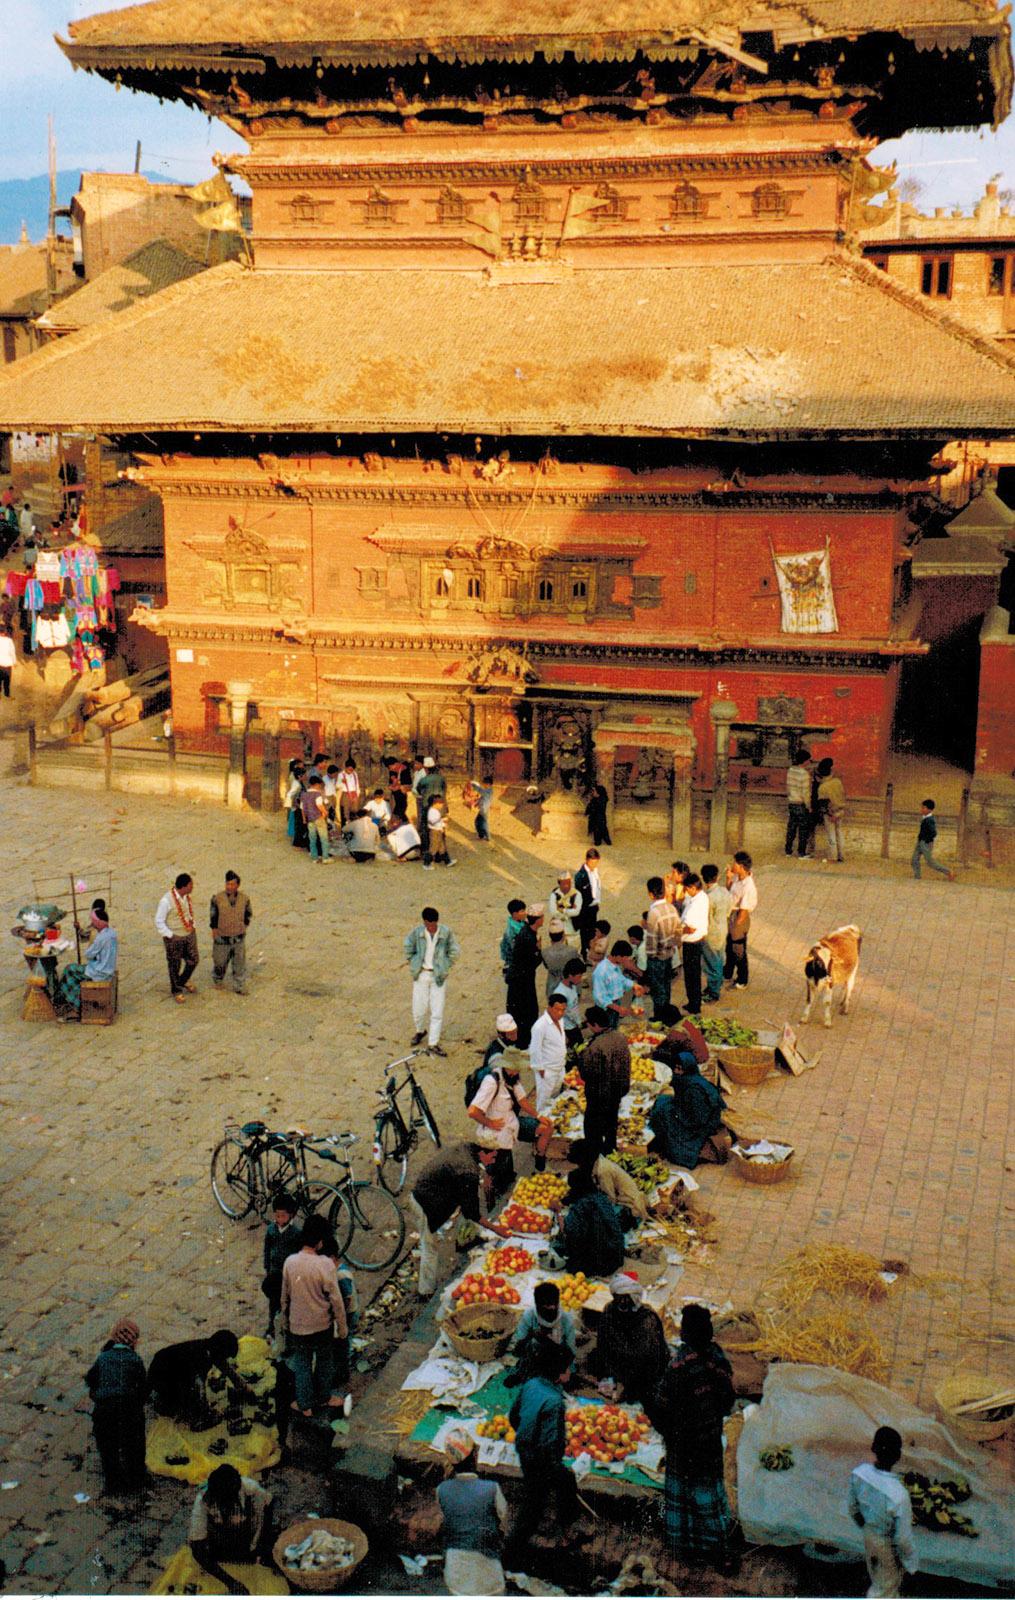 Nepal, Dubar Square - der Hauptplatz von Kathmandu 1991. Foto: Hilke Maunder